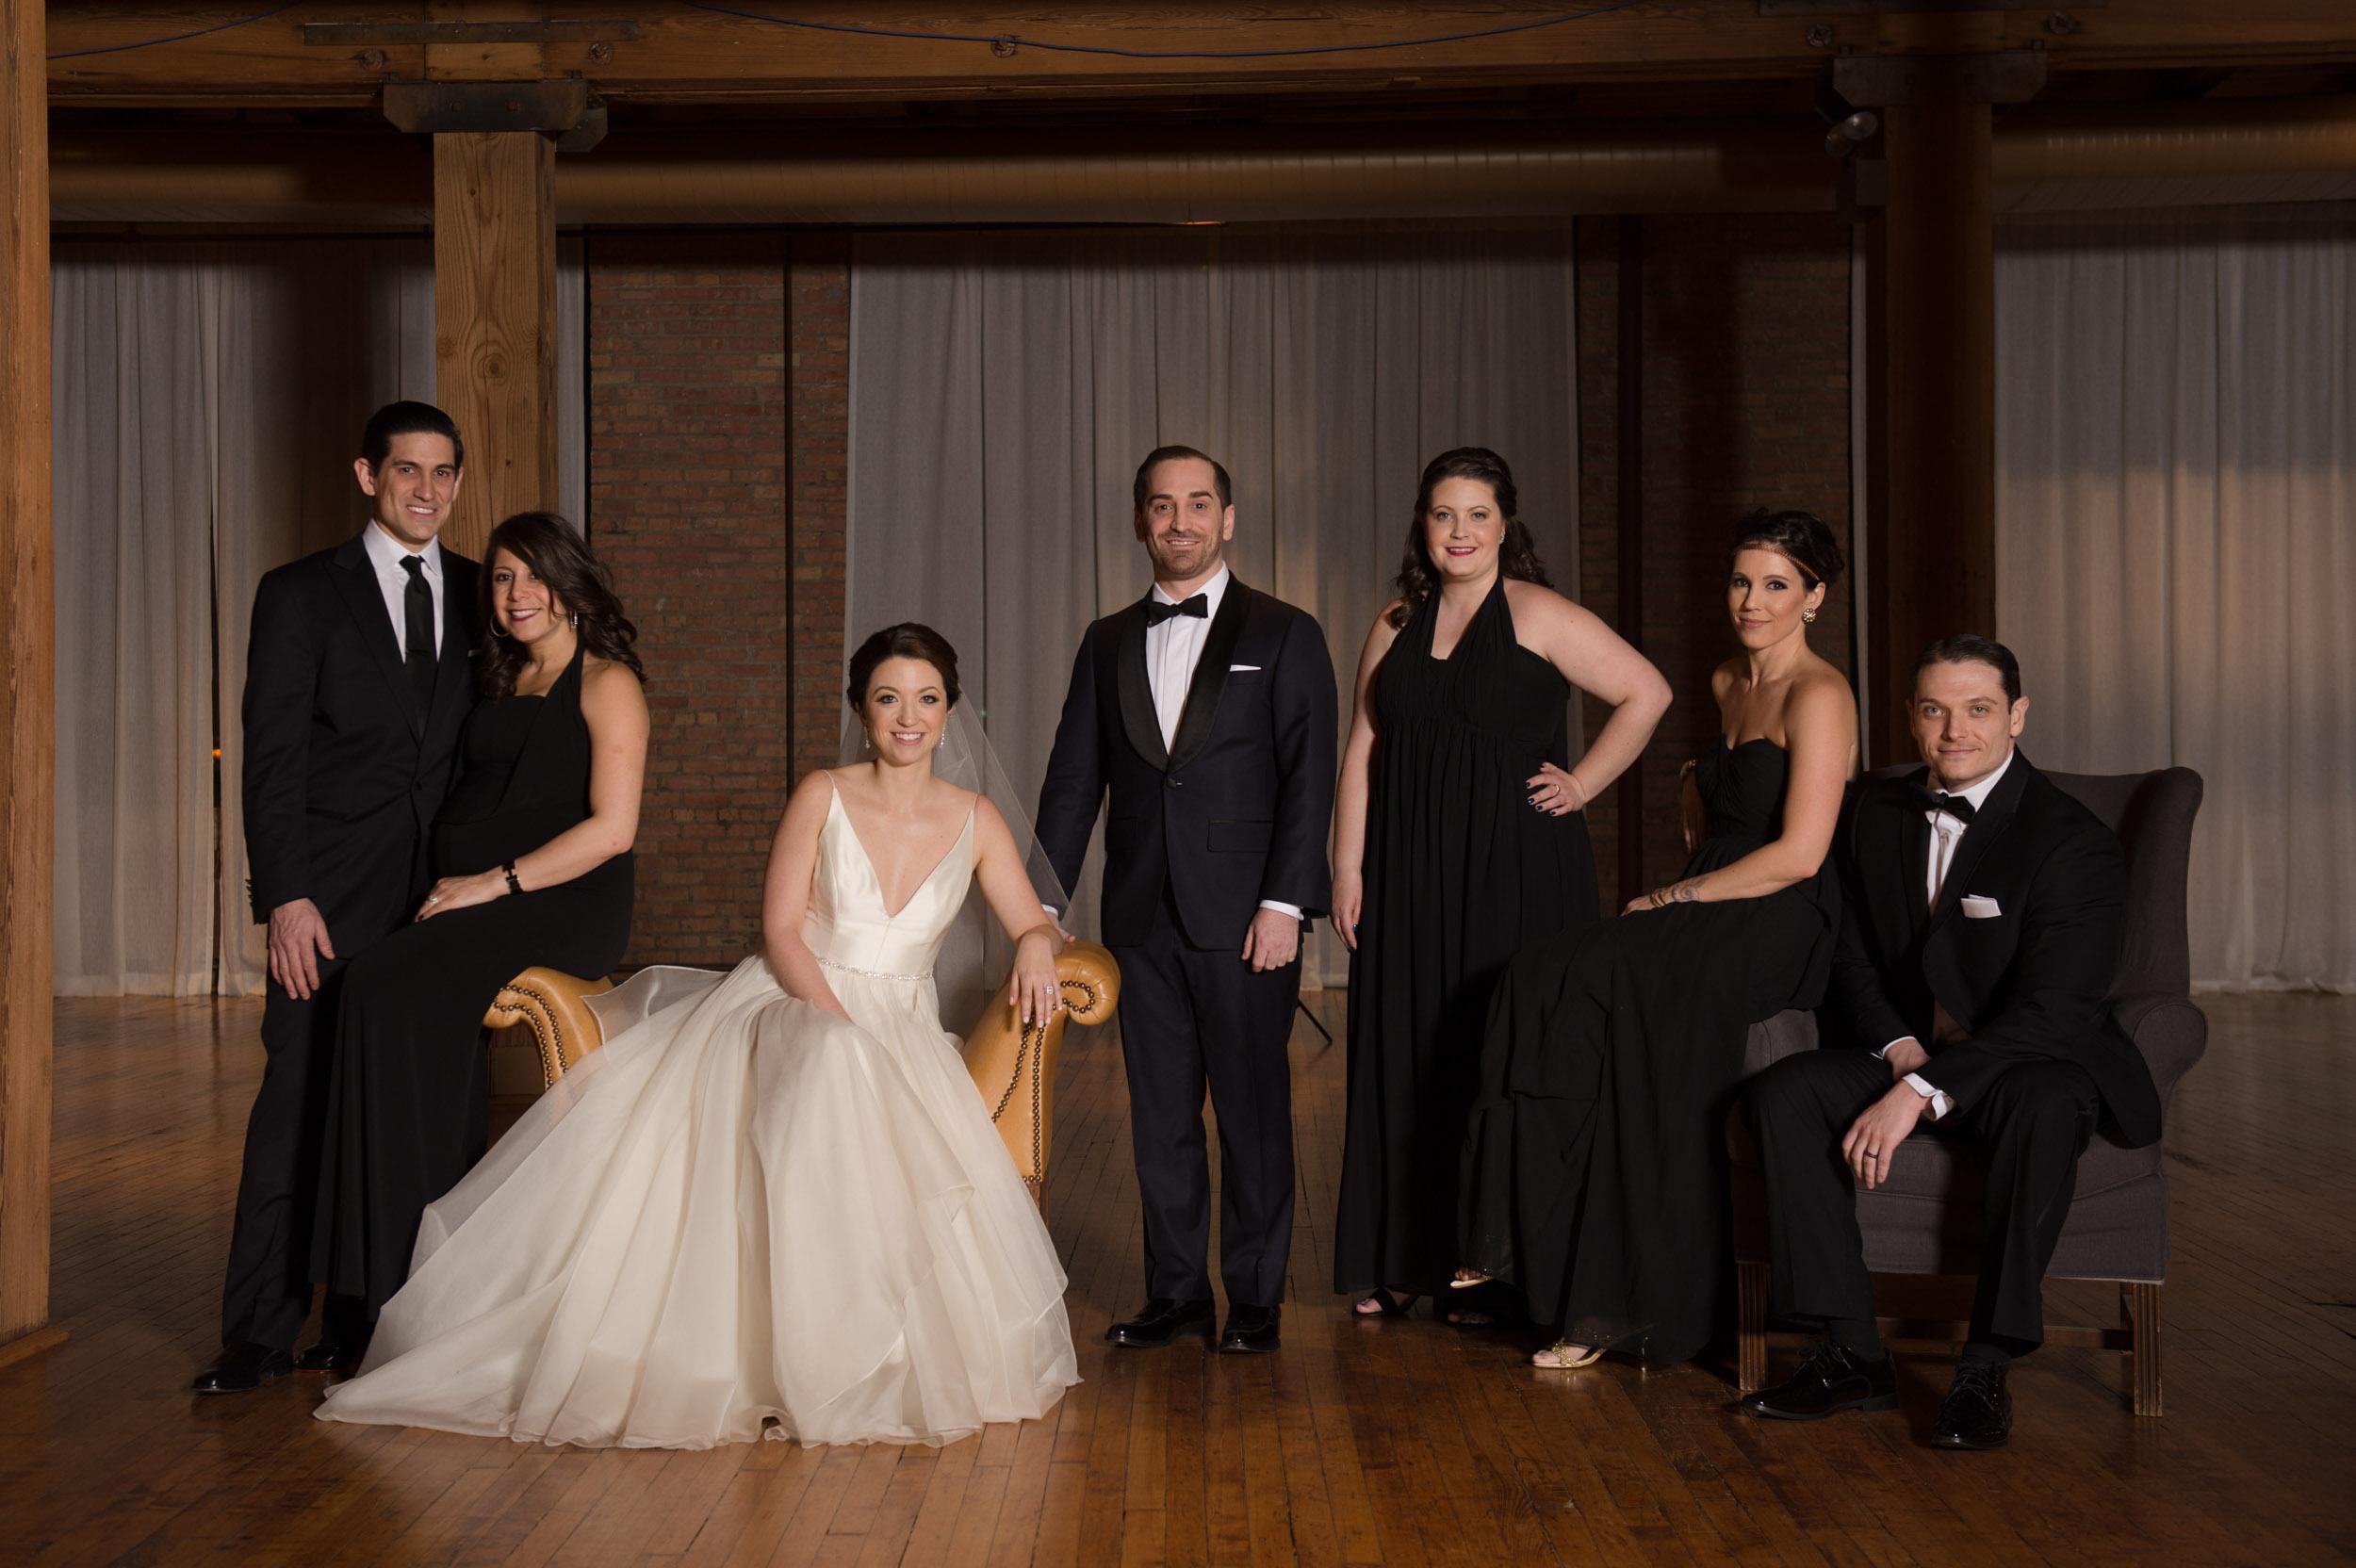 Editorial wedding party portrait at Bridgeport Art Center